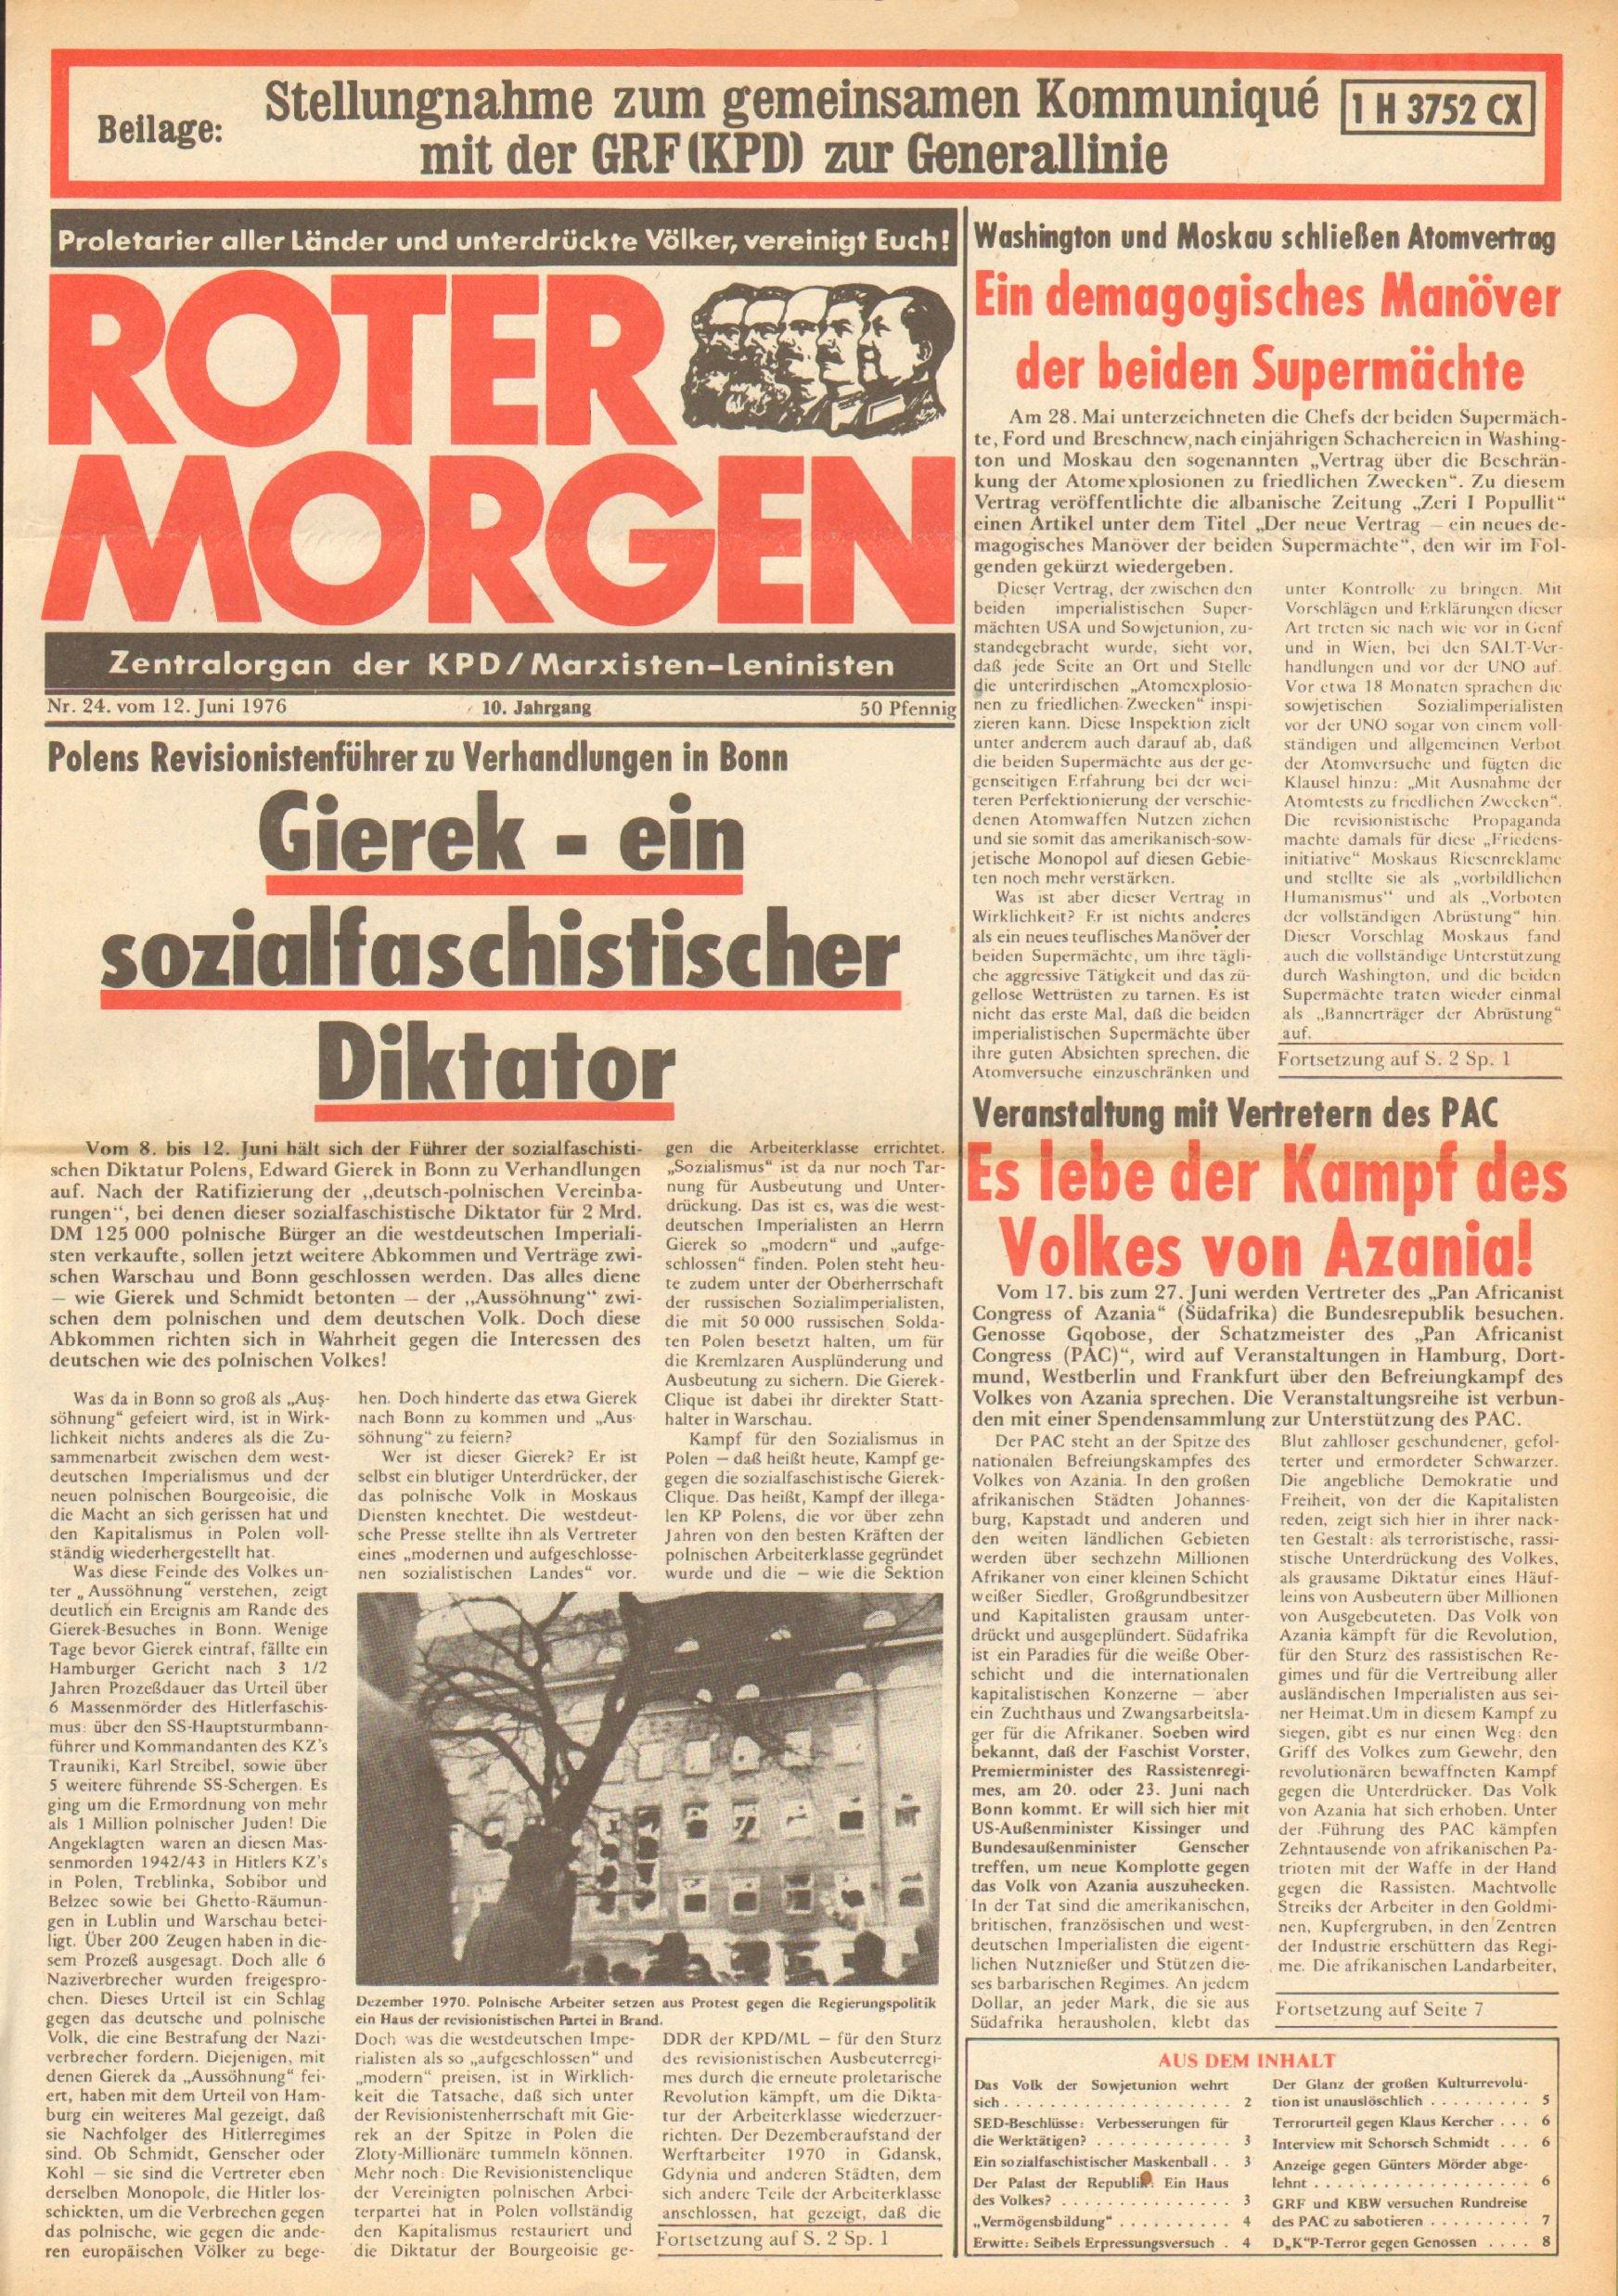 Roter Morgen, 10. Jg., 12. Juni 1976, Nr. 24, Seite 1